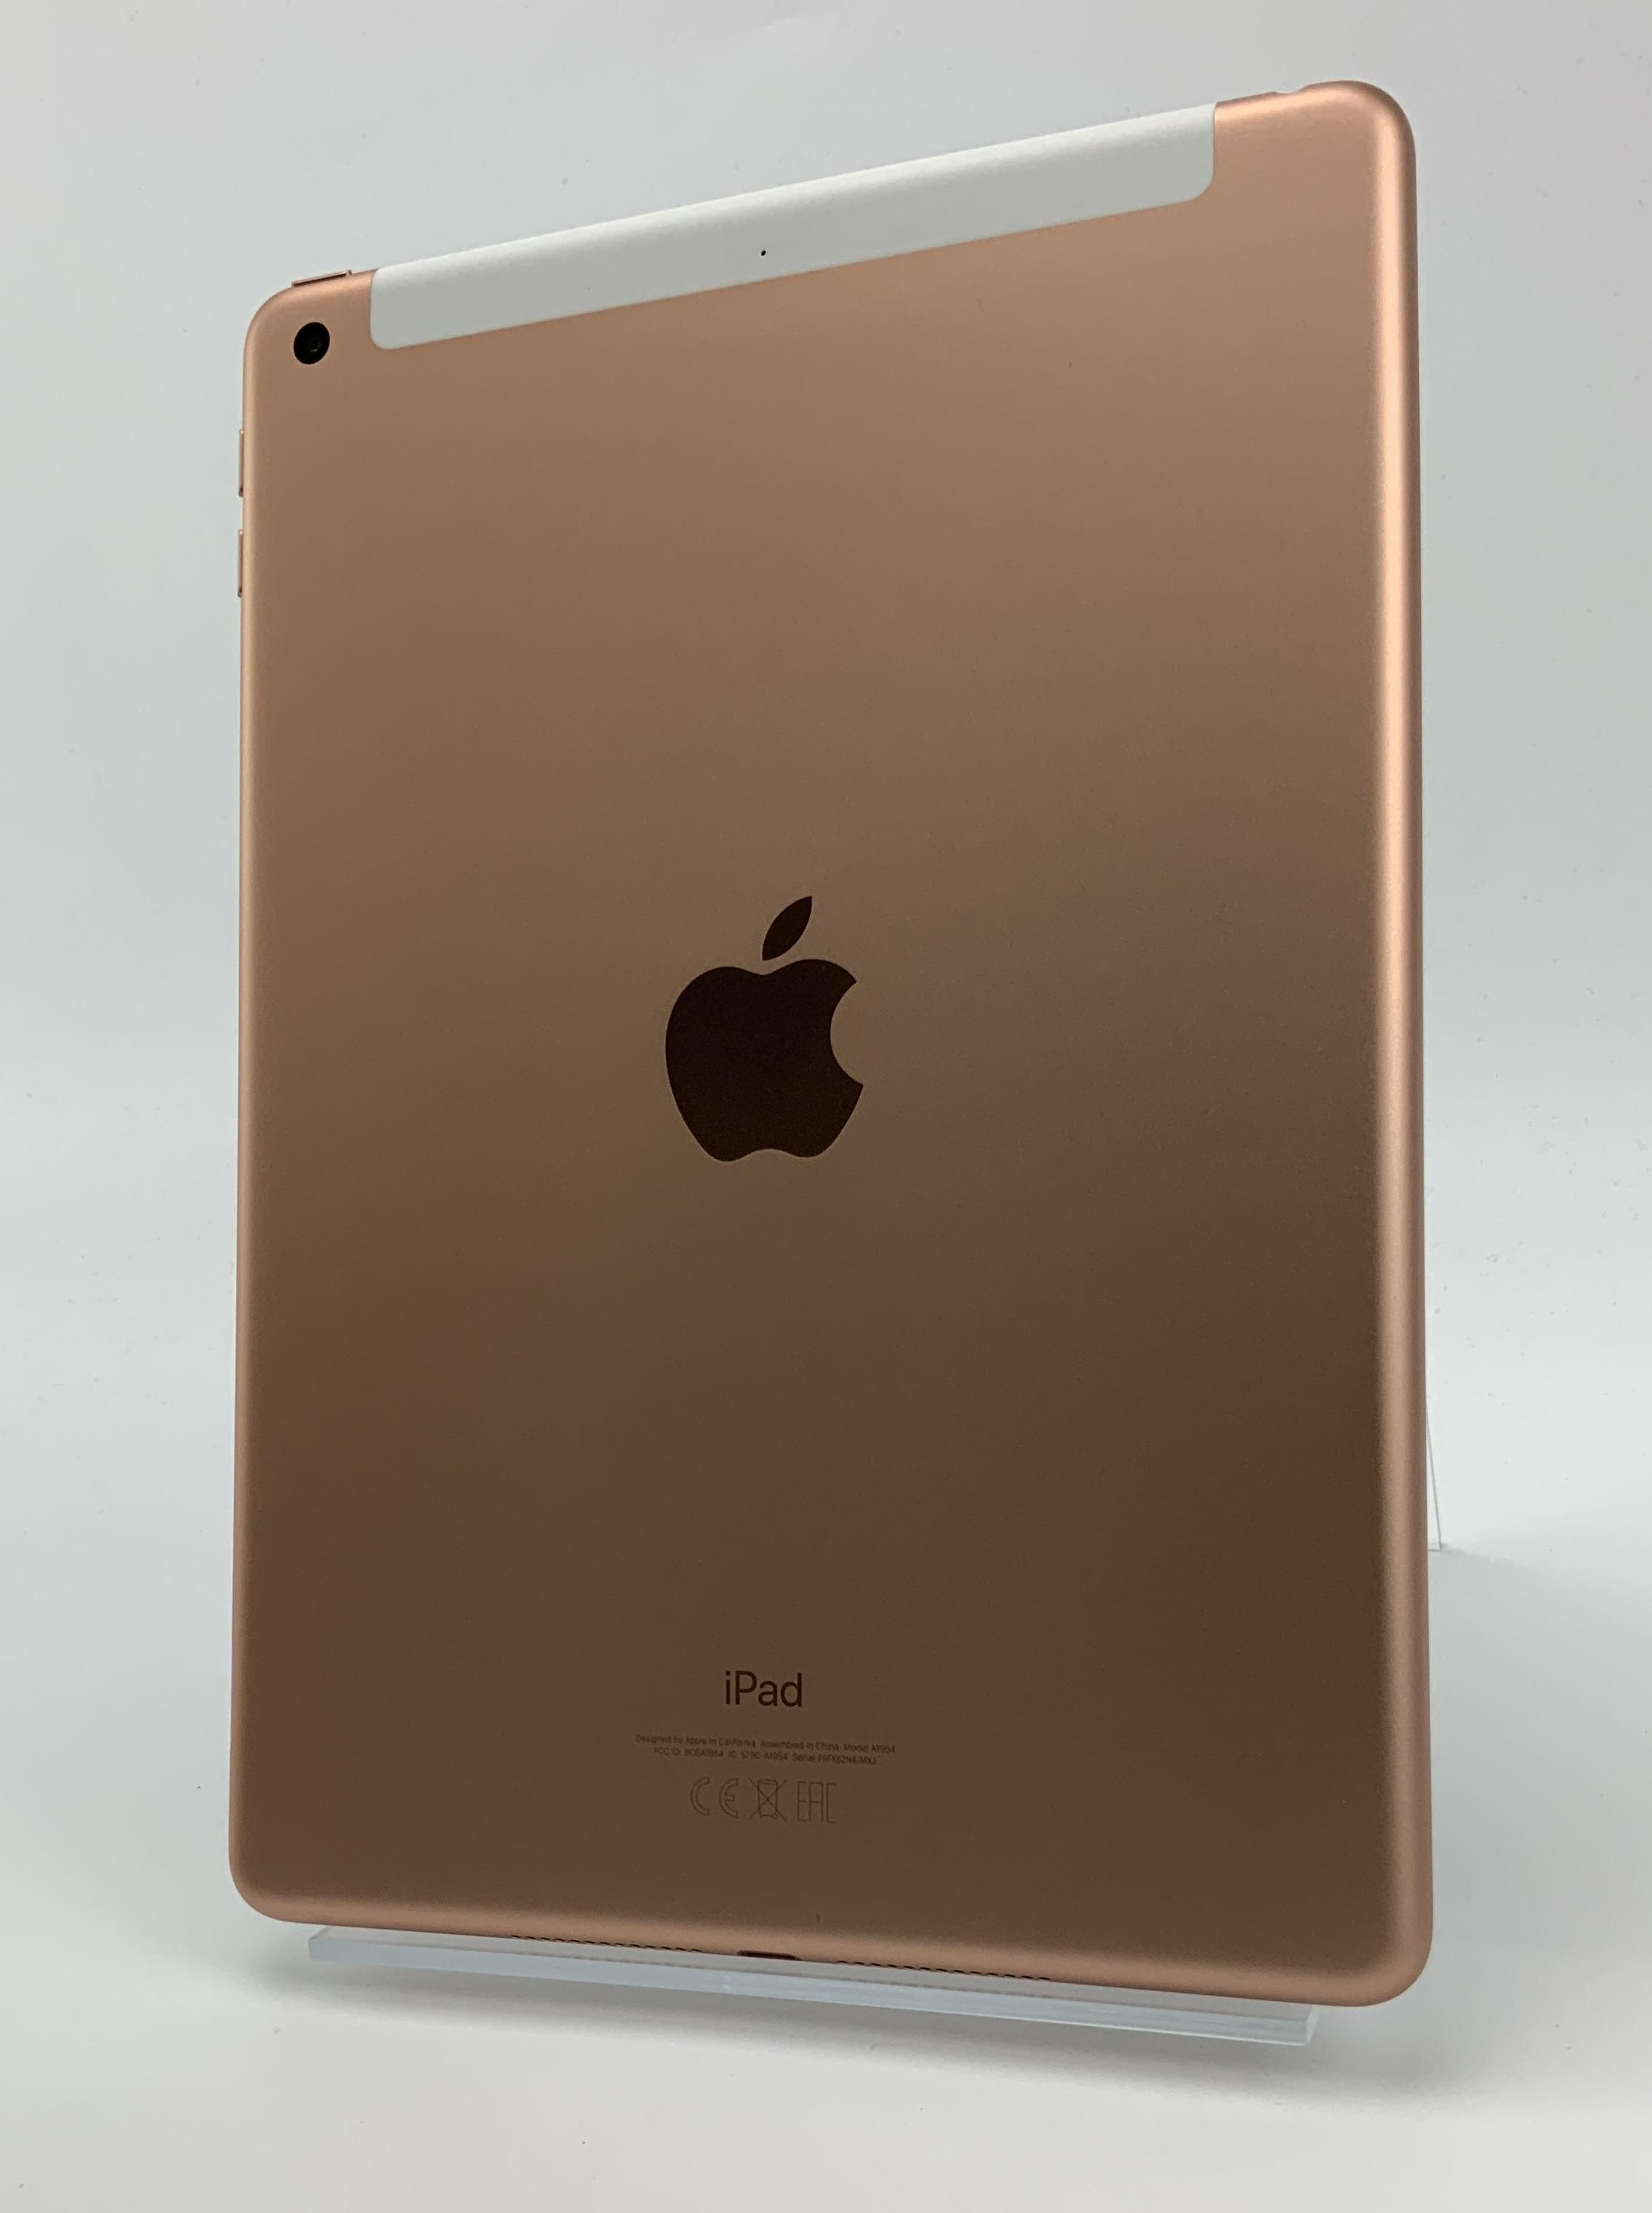 iPad 6 Wi-Fi + Cellular 32GB, 32GB, Gold, imagen 2